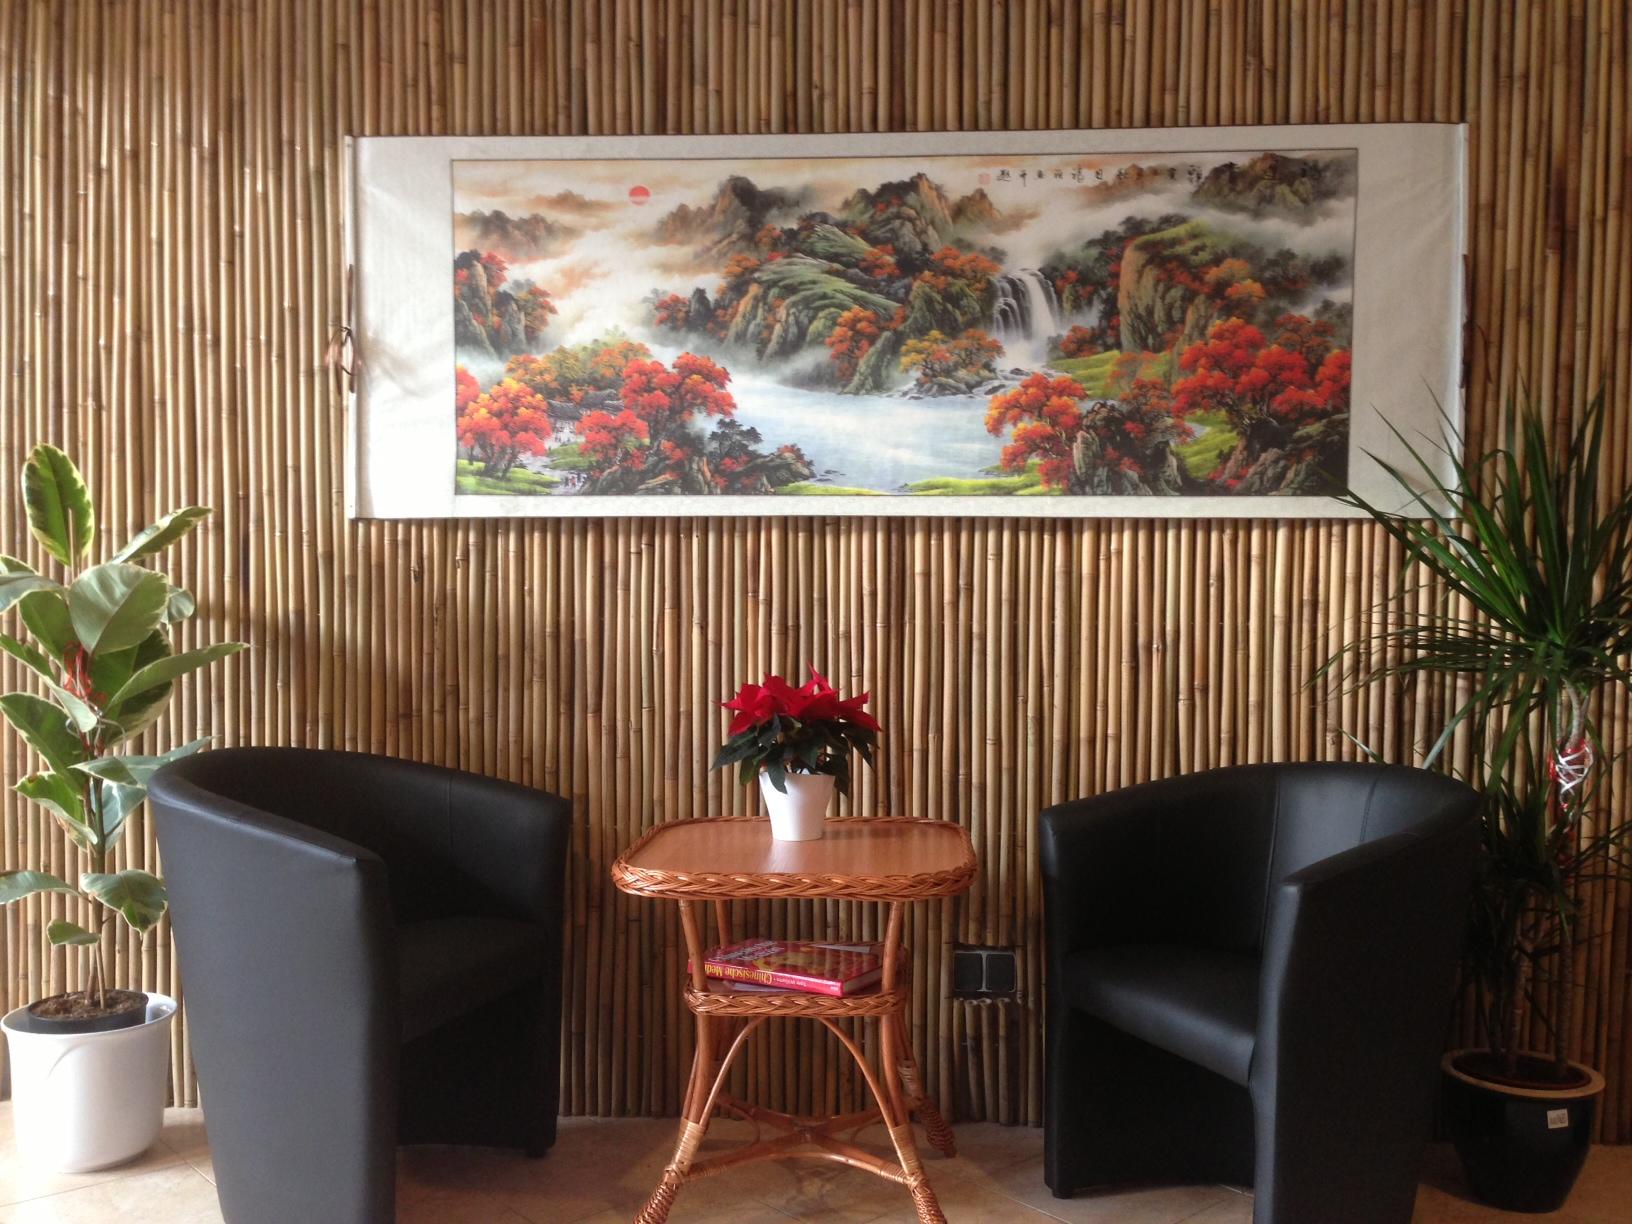 chinamassage in berlin startseite. Black Bedroom Furniture Sets. Home Design Ideas